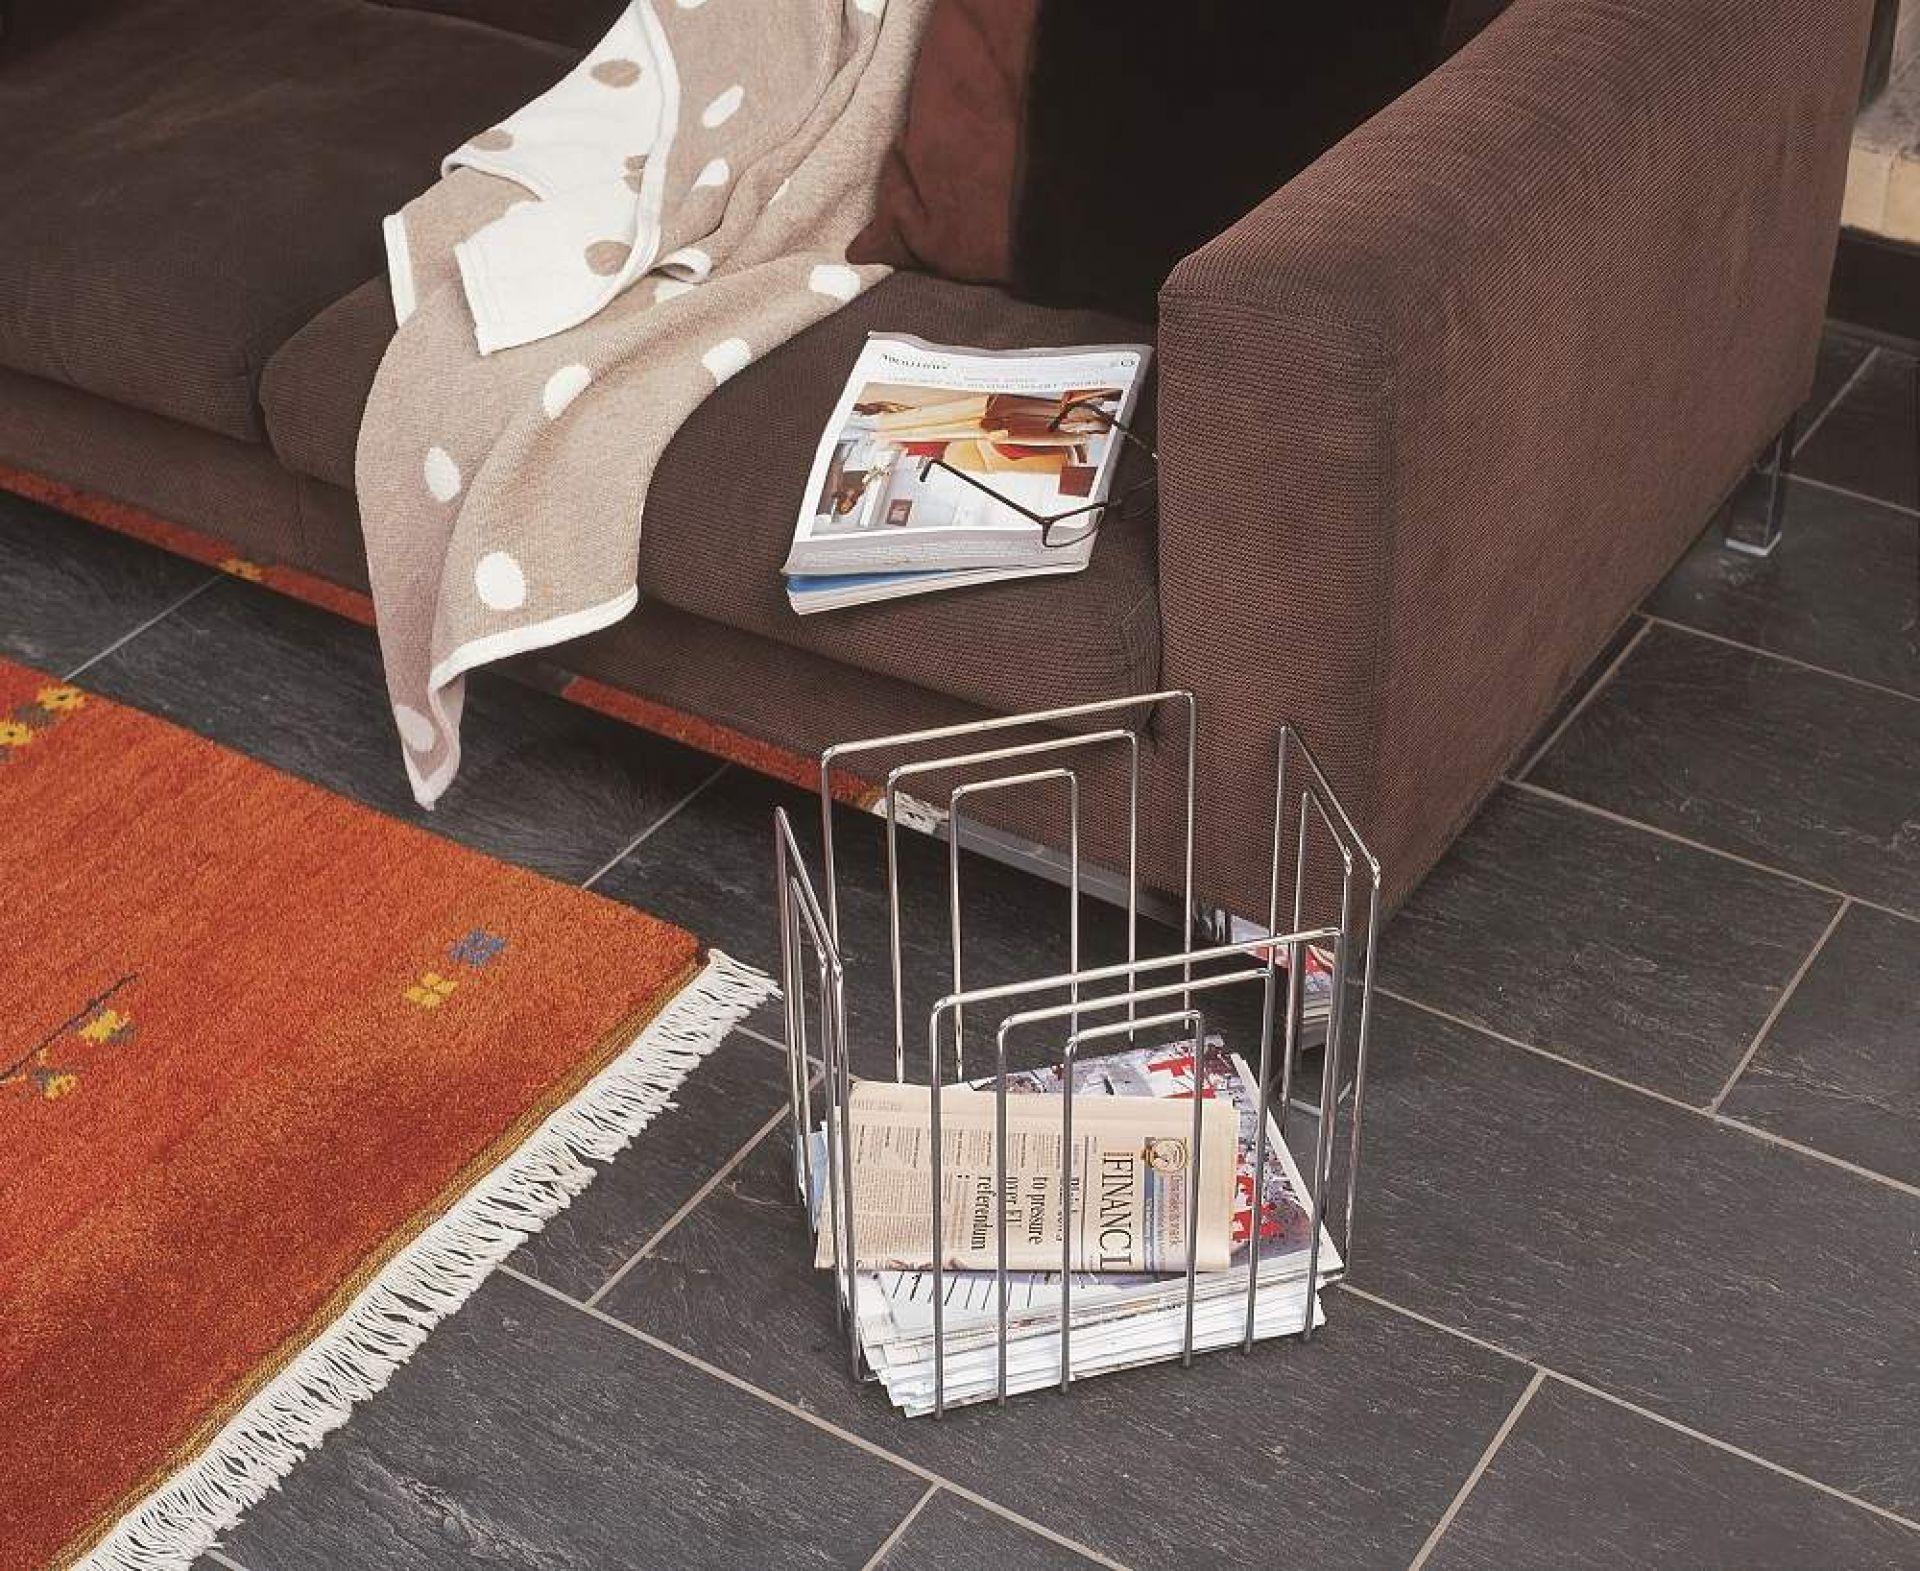 DER PAPIERSAMMLER Papiersammler/Zeitungsbinder compact MERLO | T